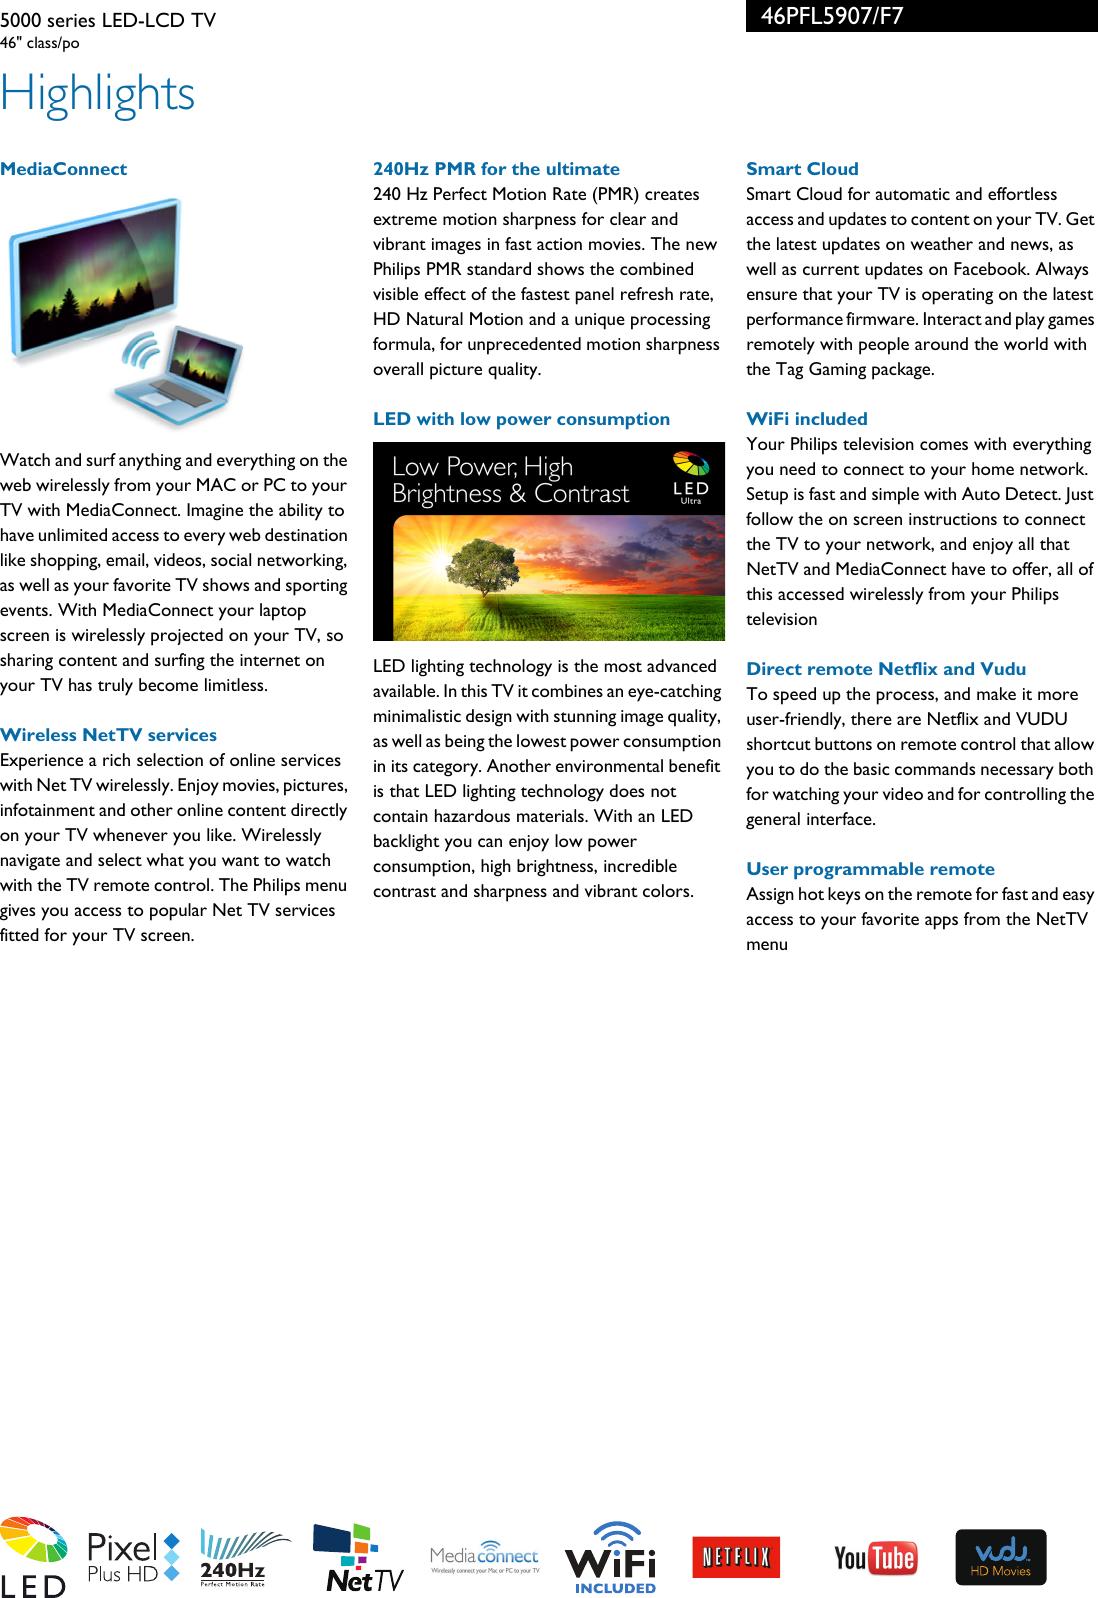 Philips 46PFL5907/F7 5000 Series LED LCD TV User Manual Leaflet